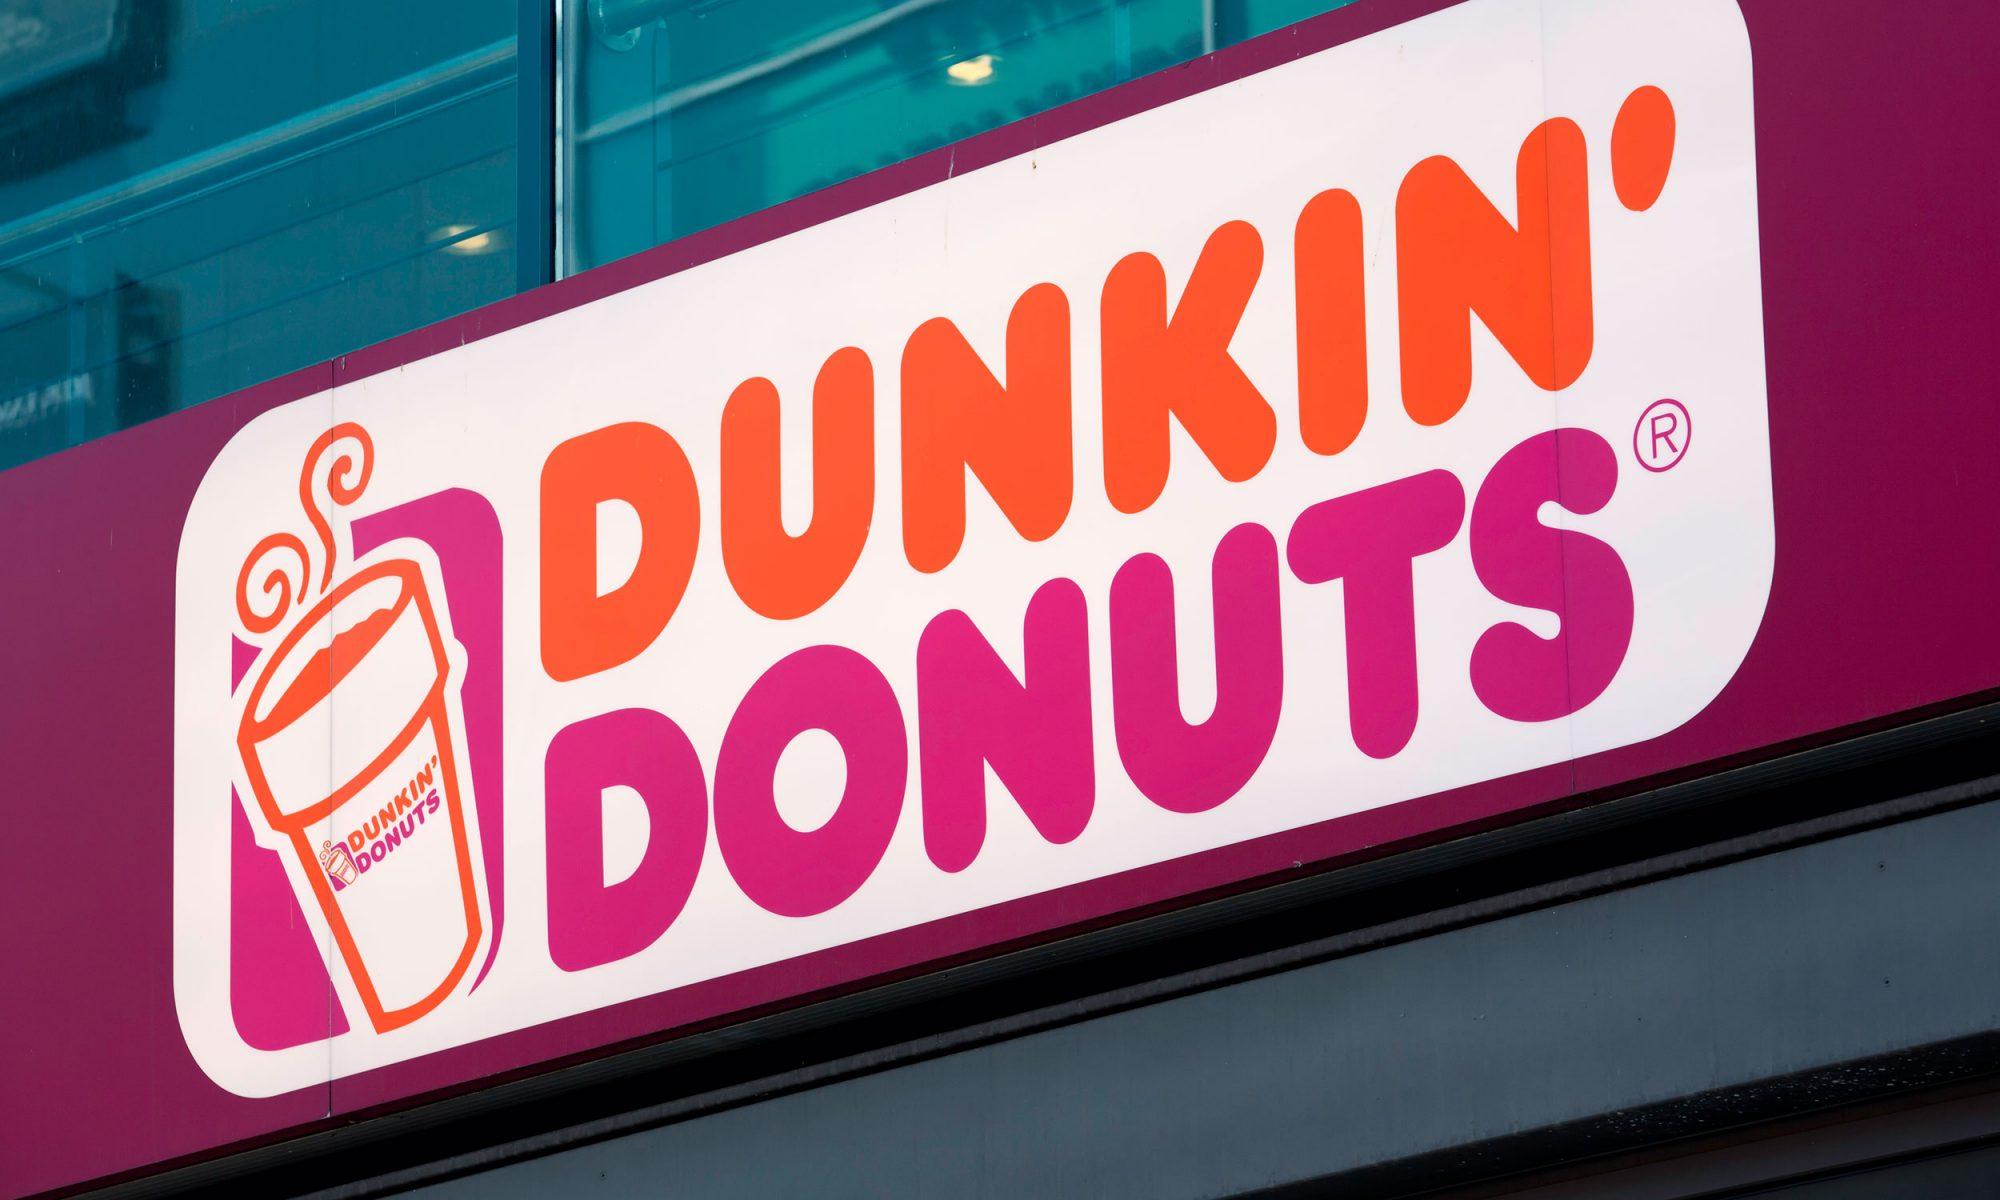 krispy kreme may buy dunkin donuts